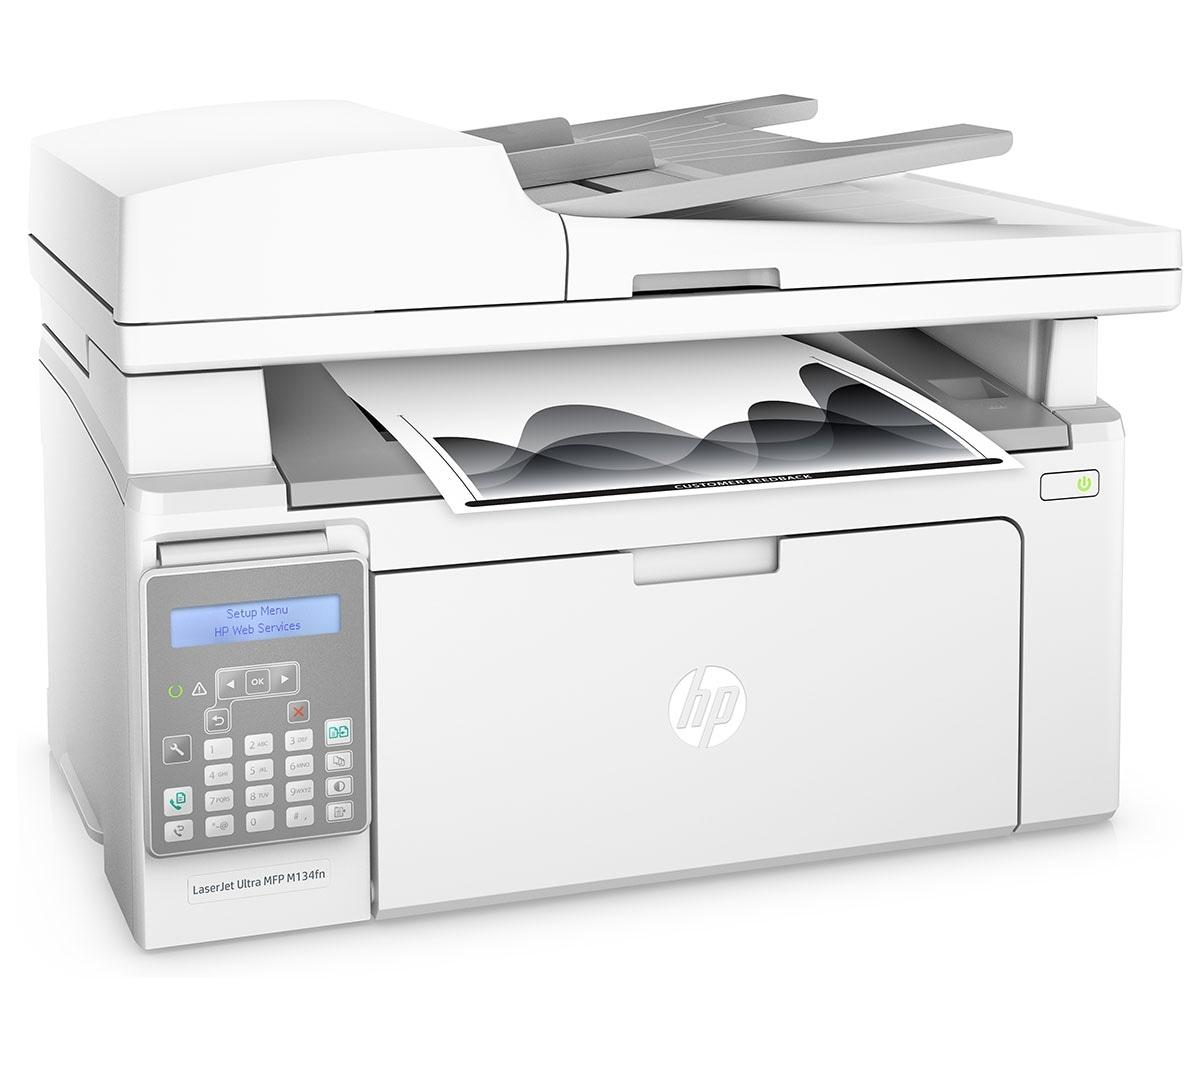 HP G3Q67A LaserJet Ultra MFP M134fn Multi-Function Print Color Laser Printer